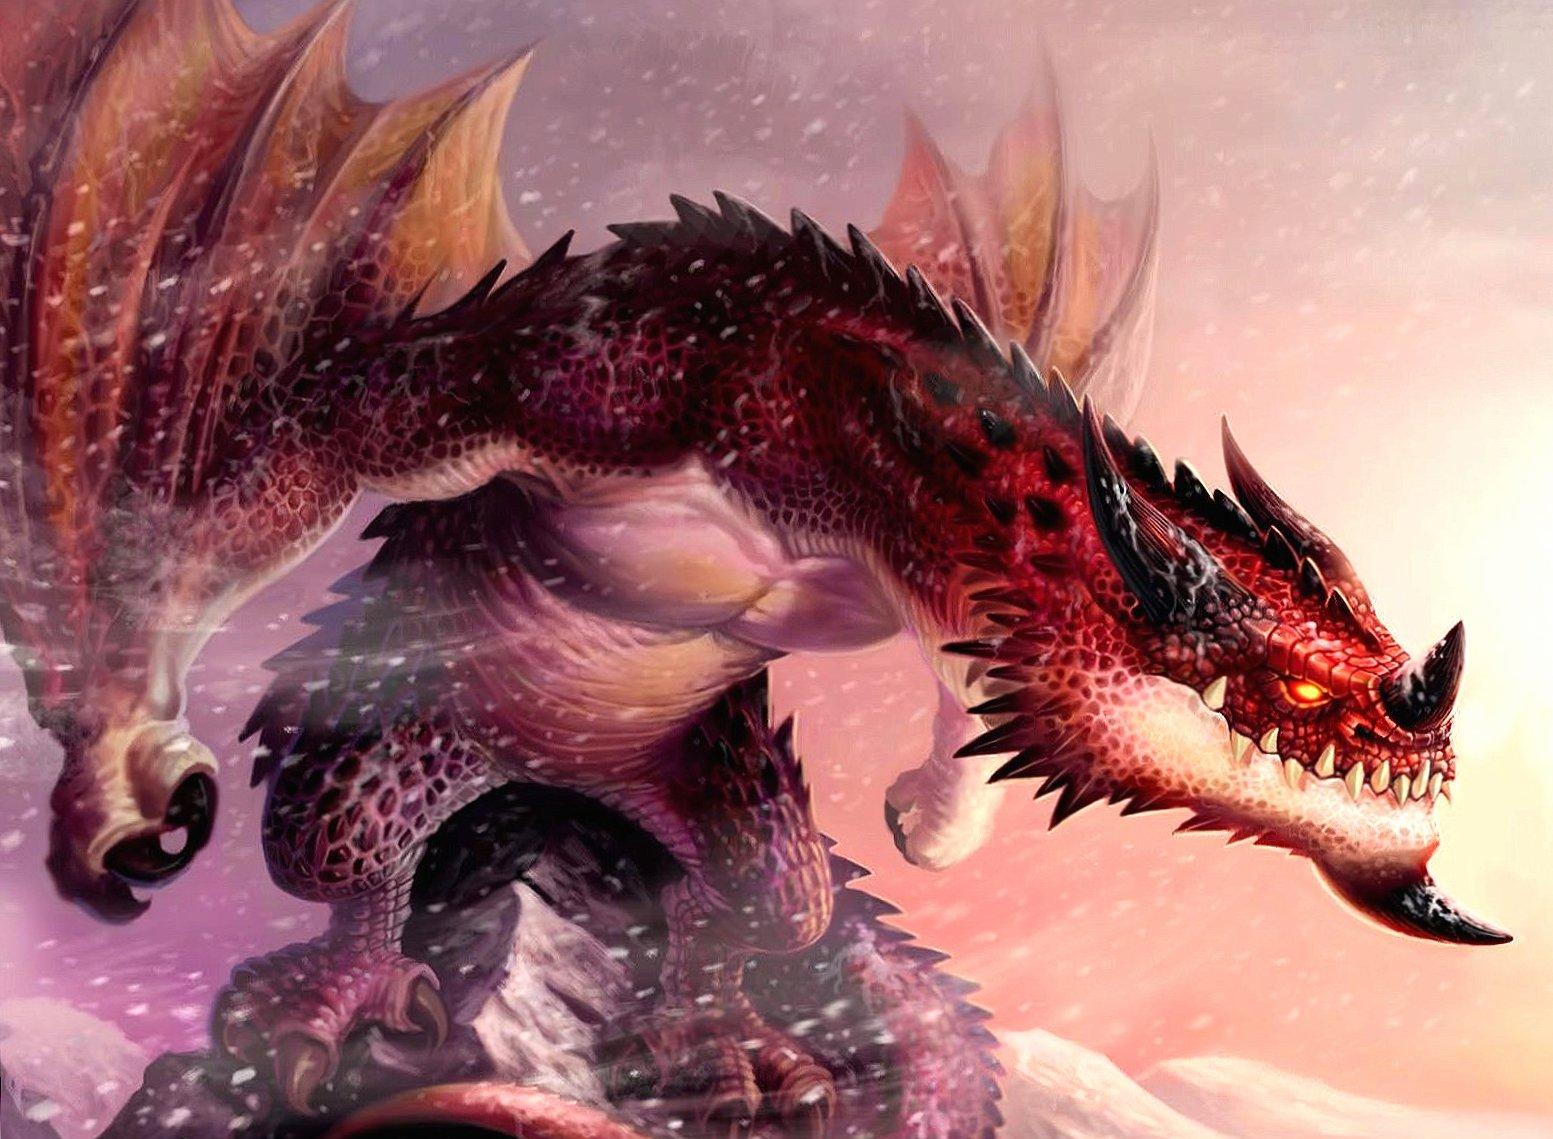 Big dragon wallpapers HD quality